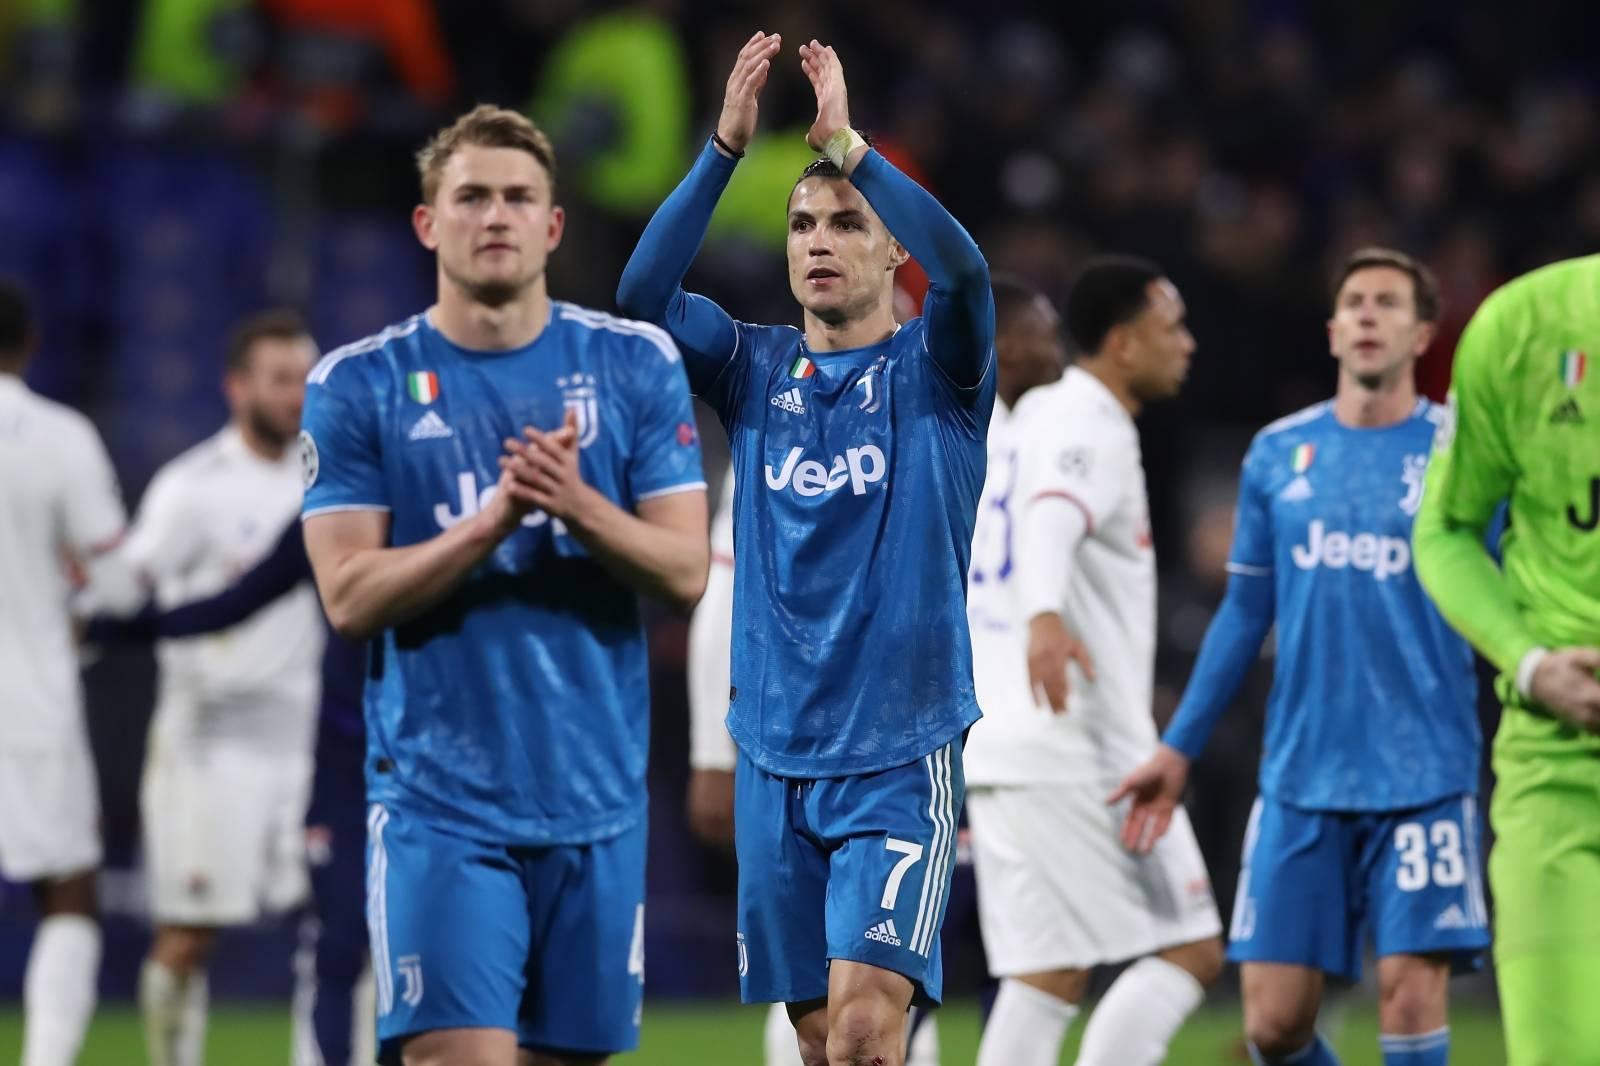 Lyon v Juventus - UEFA Champions League - Round of 16 - First Leg - Groupama Stadium